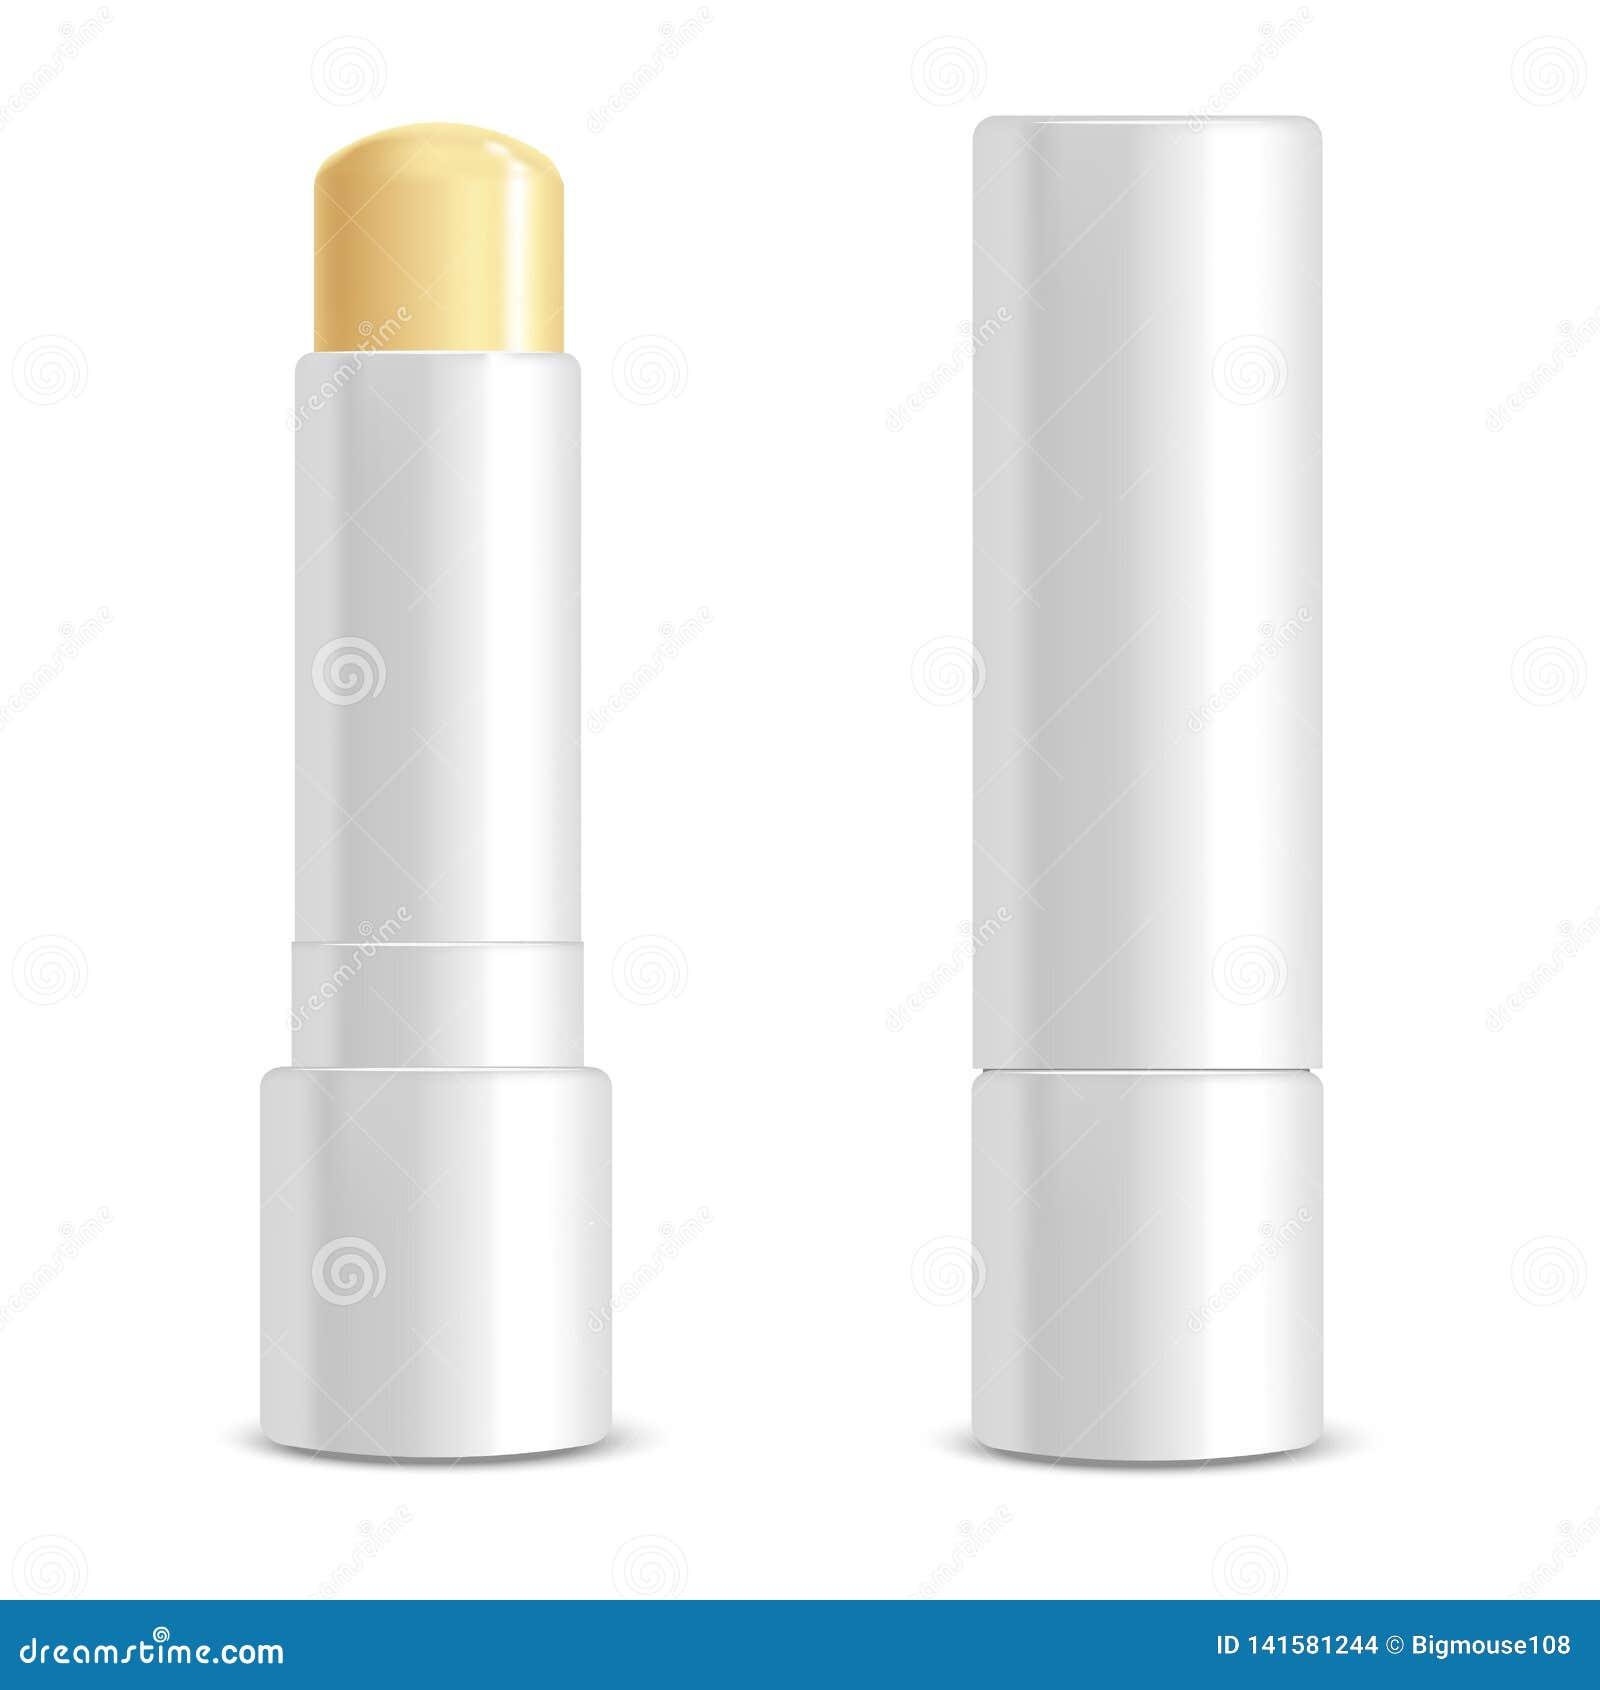 Realistic 3d Detailed White Blank Lip Balm Stick Template Mockup Set